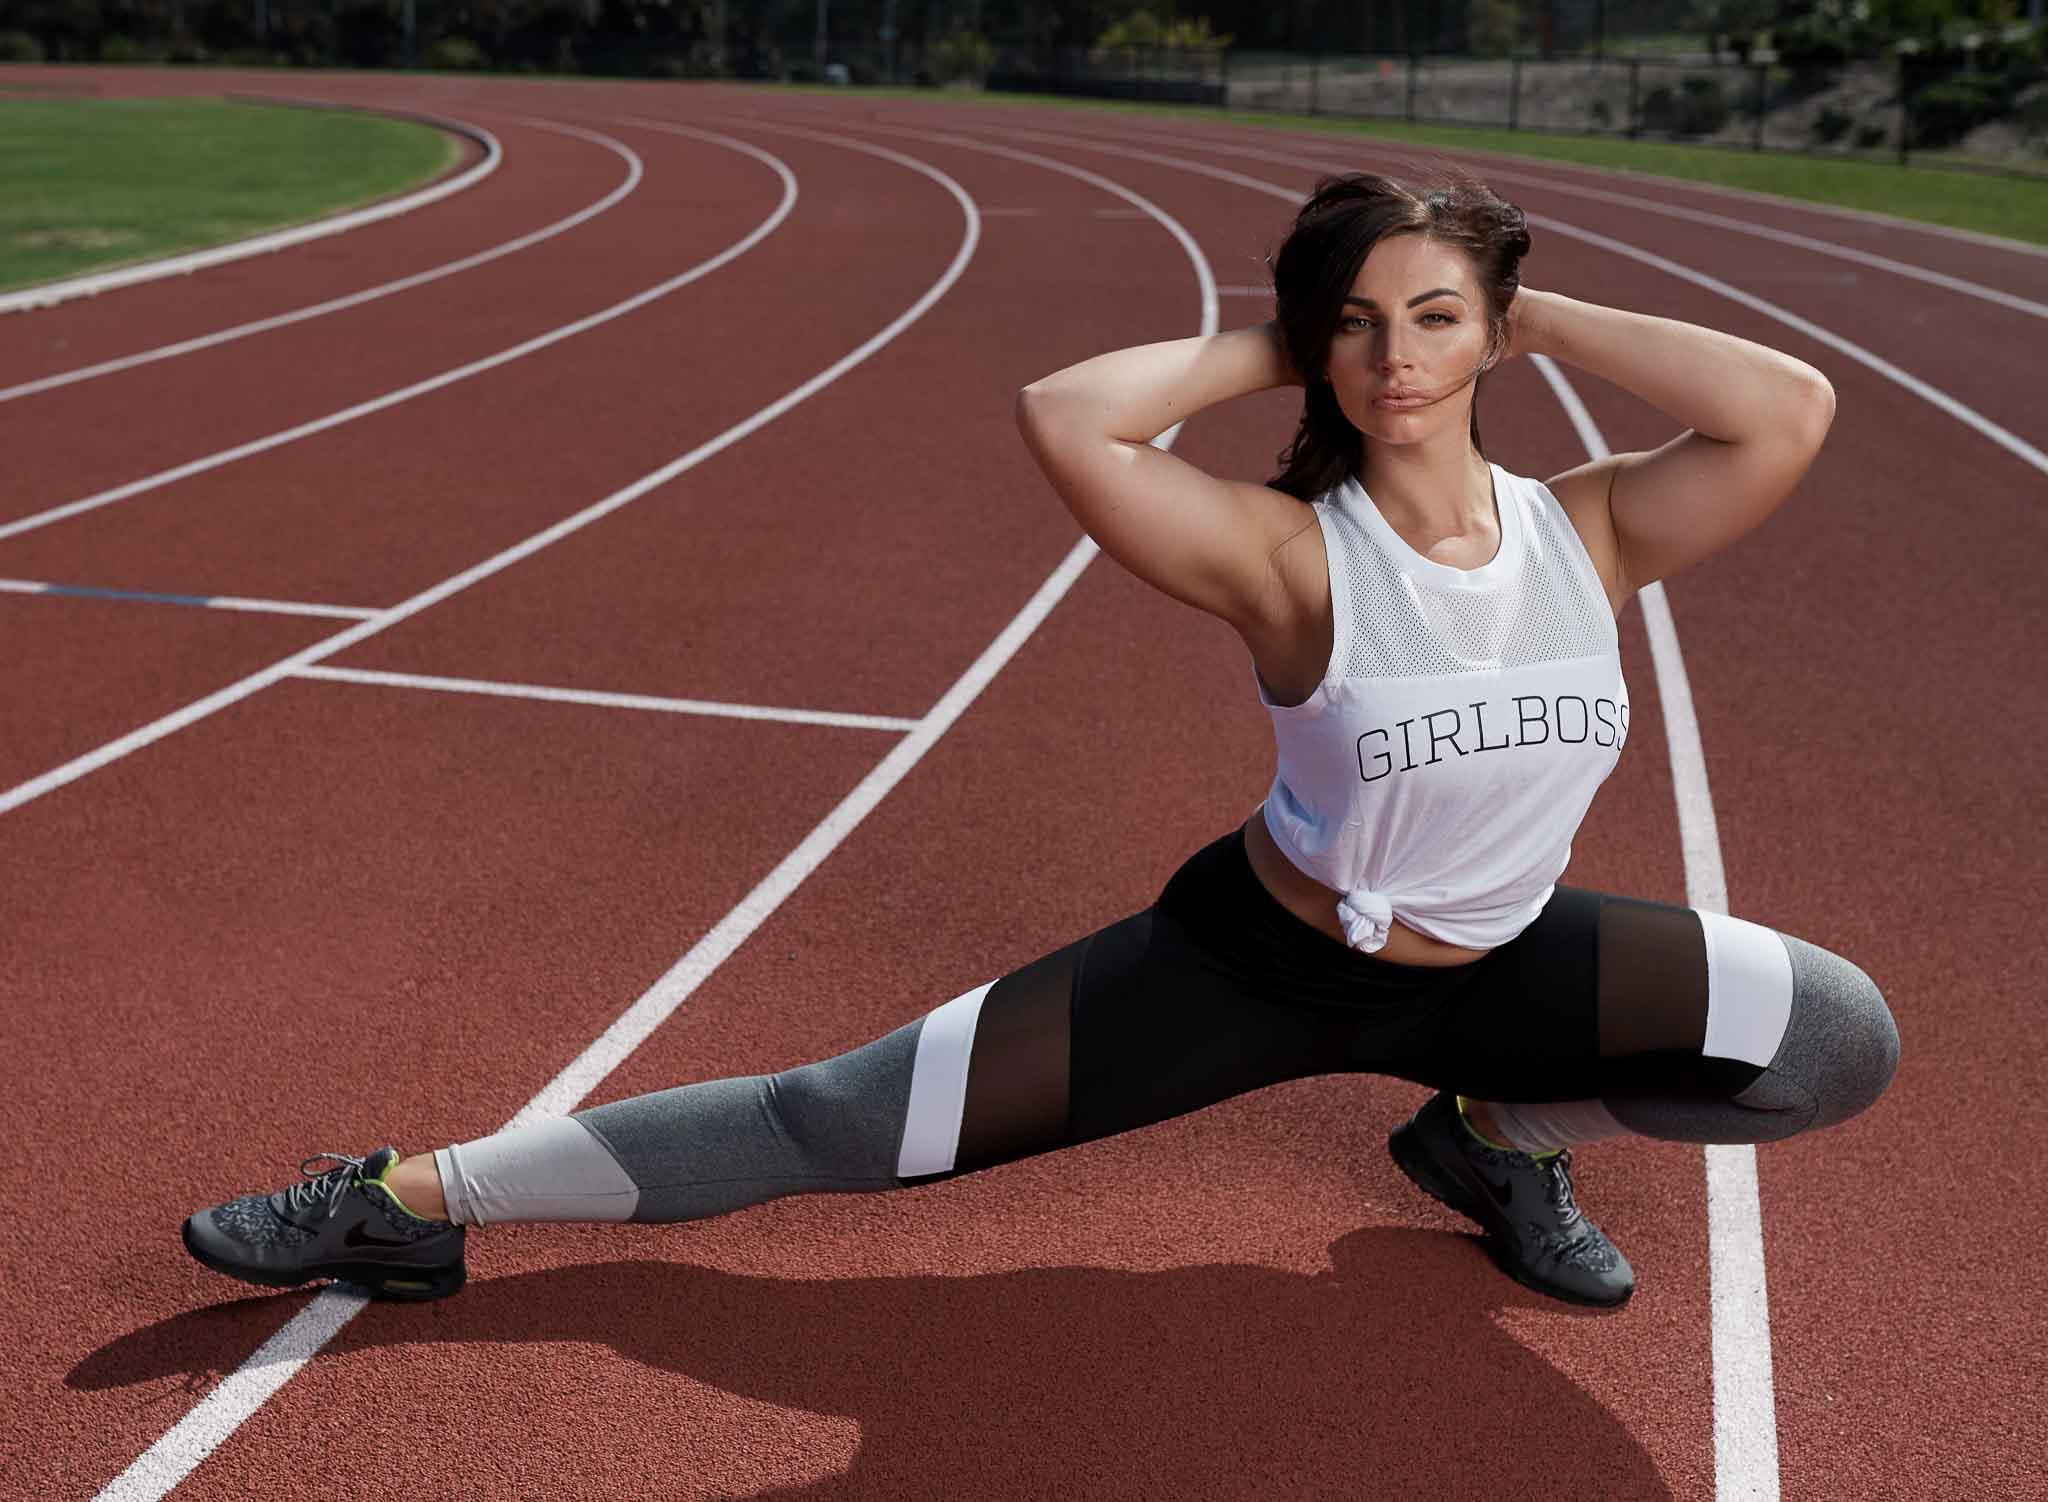 Brihannan stretching on running track